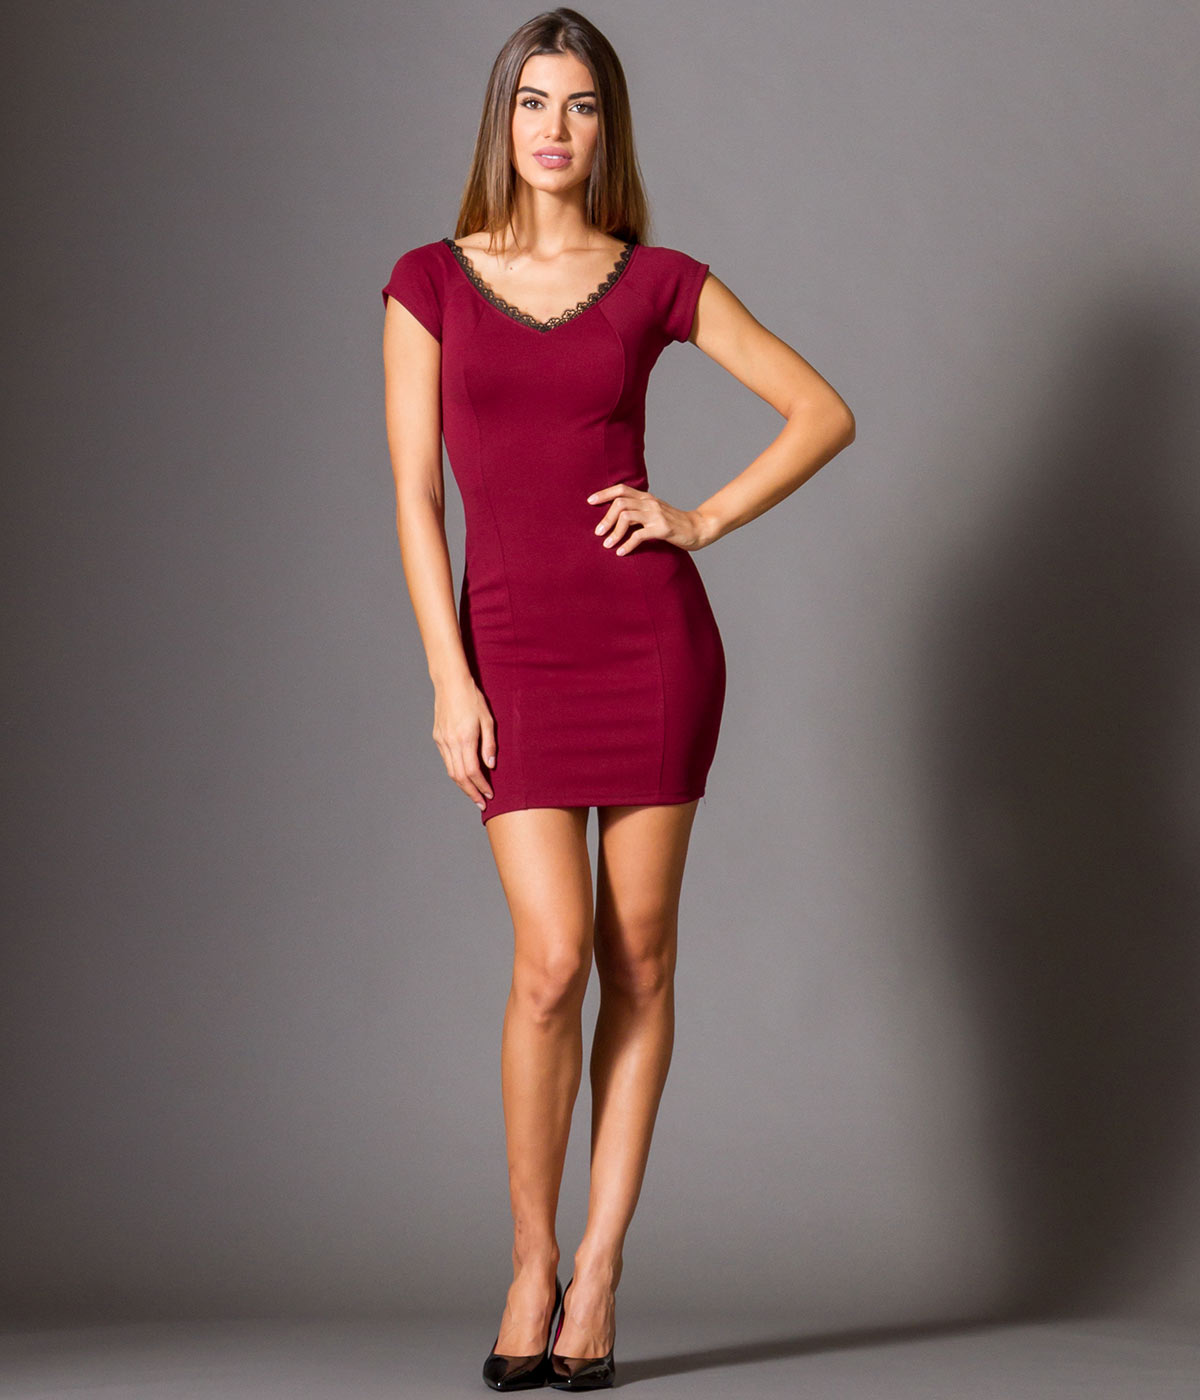 55f17cdbe99e Γυναικεία   Ρούχα   Φορέματα   Mini Φόρεμα Κρεπ με Βε και Δαντελα -  GoldenShopping.gr